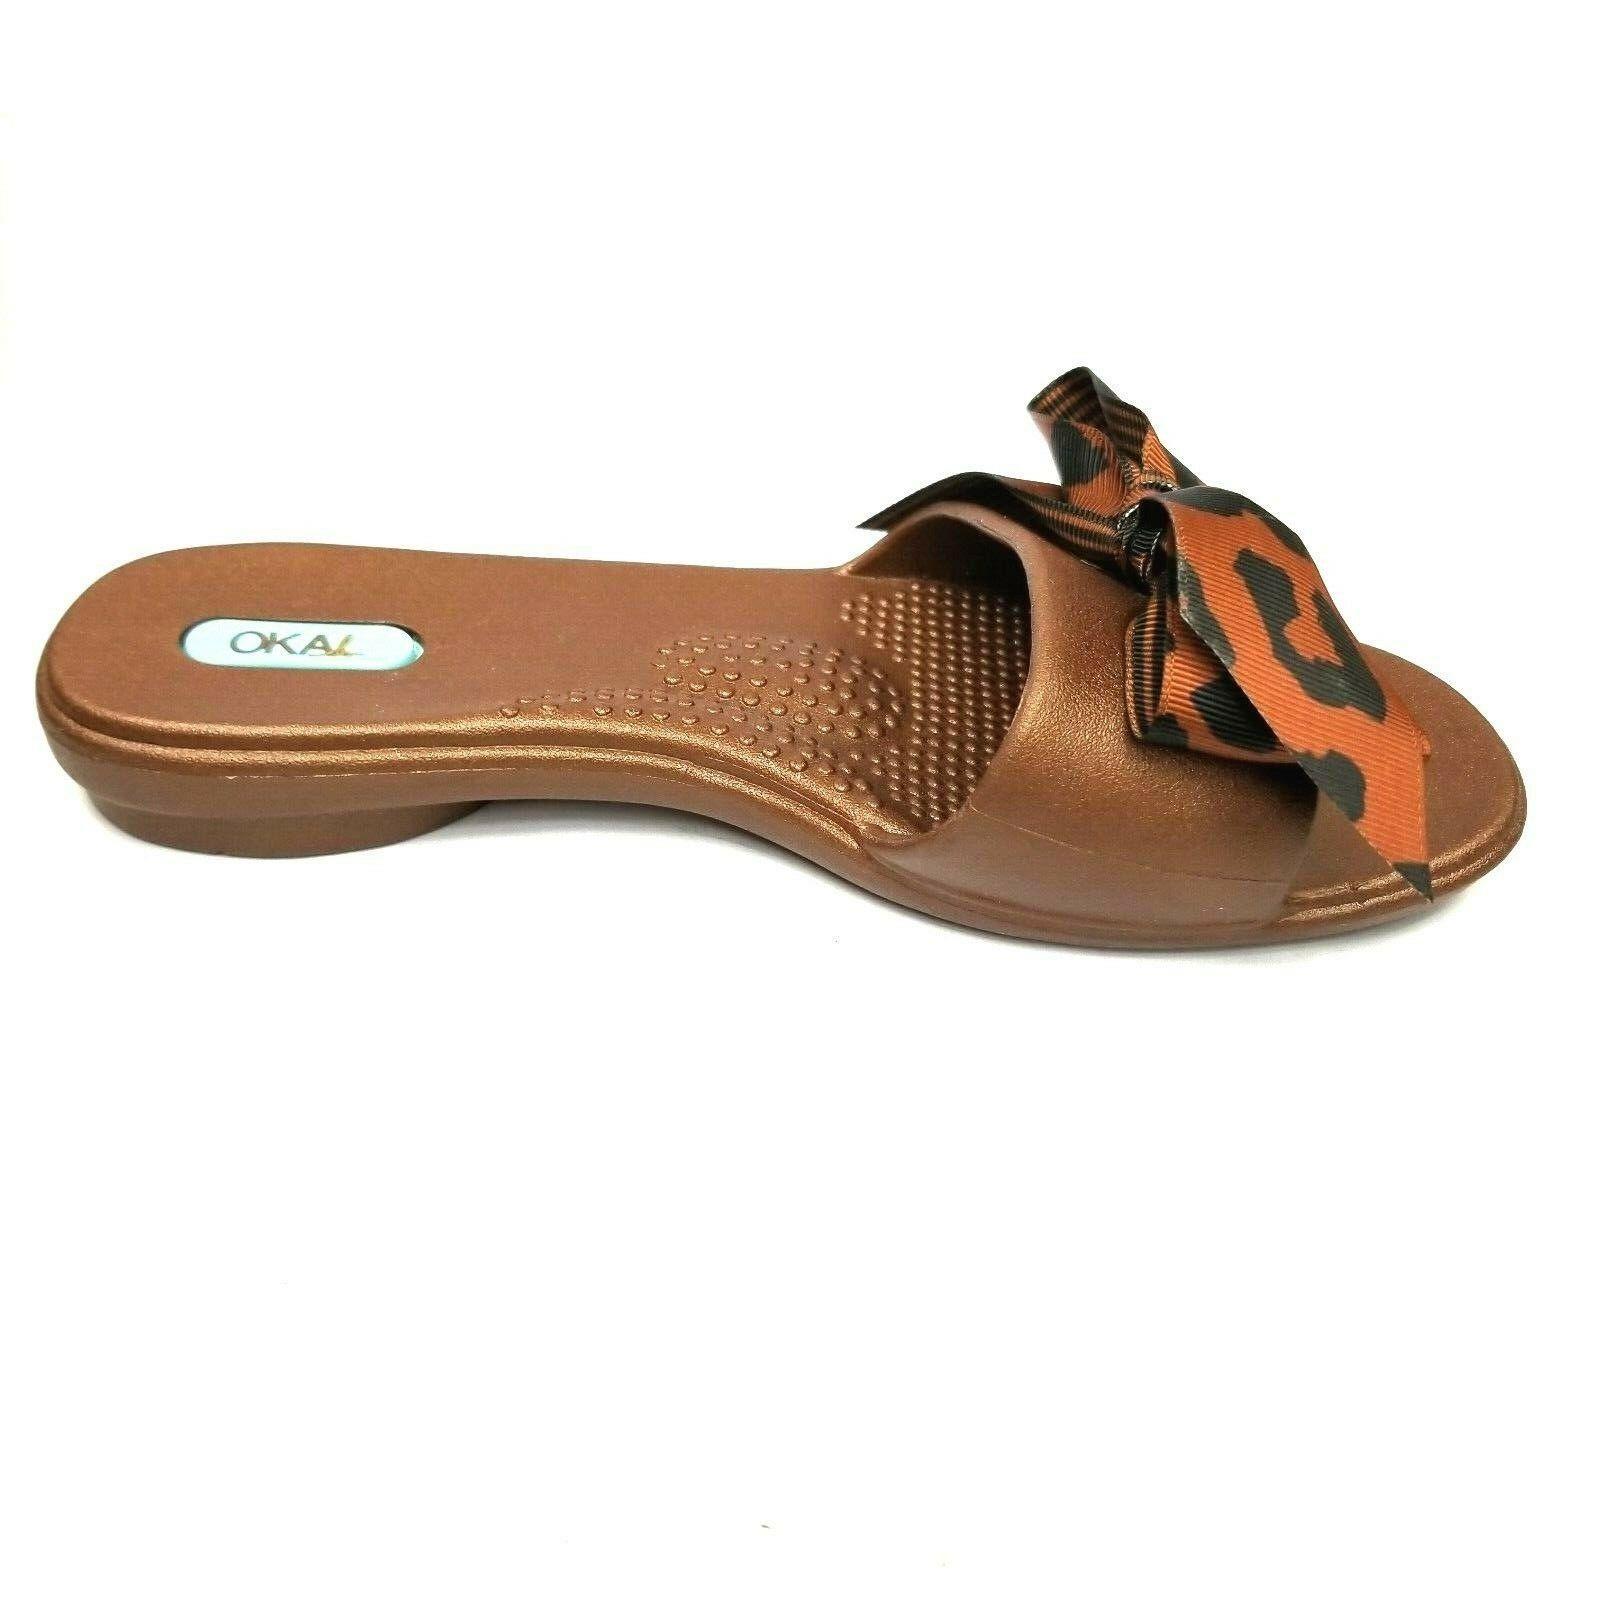 Oka B Womens Shoes Size Small Flip Flops Sandals Brown Animal Print Bow